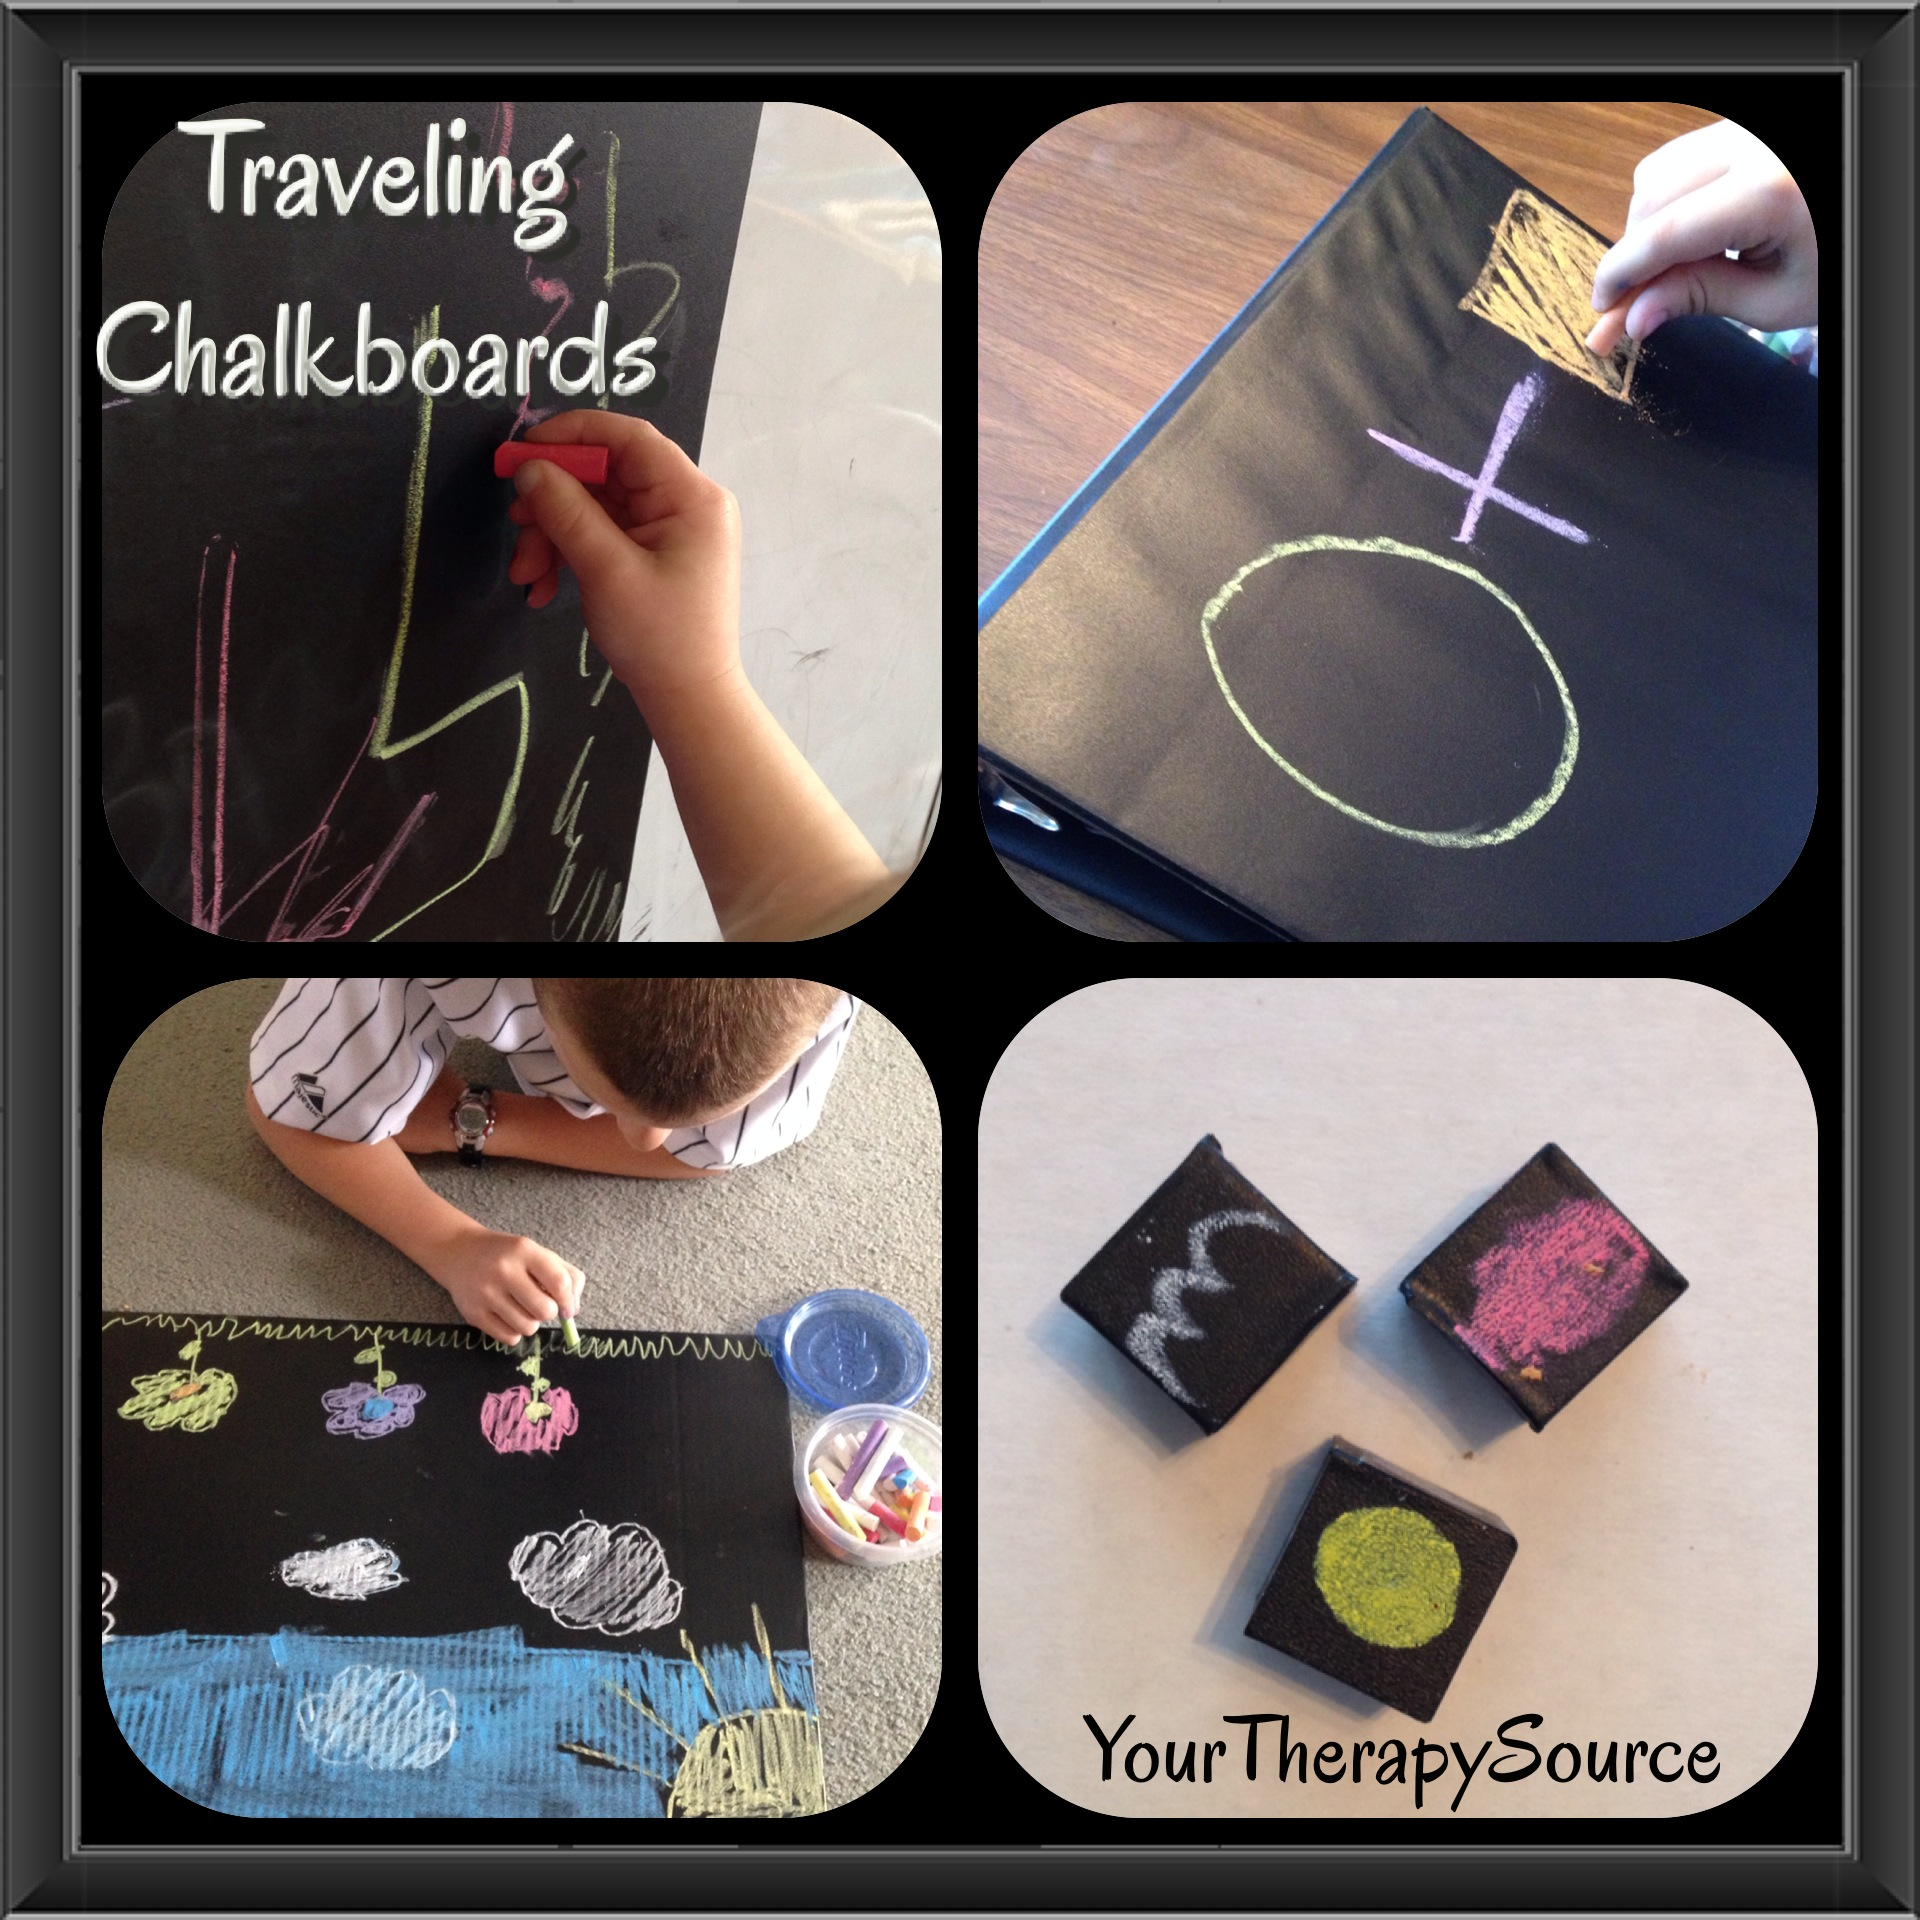 traveling chalkboards